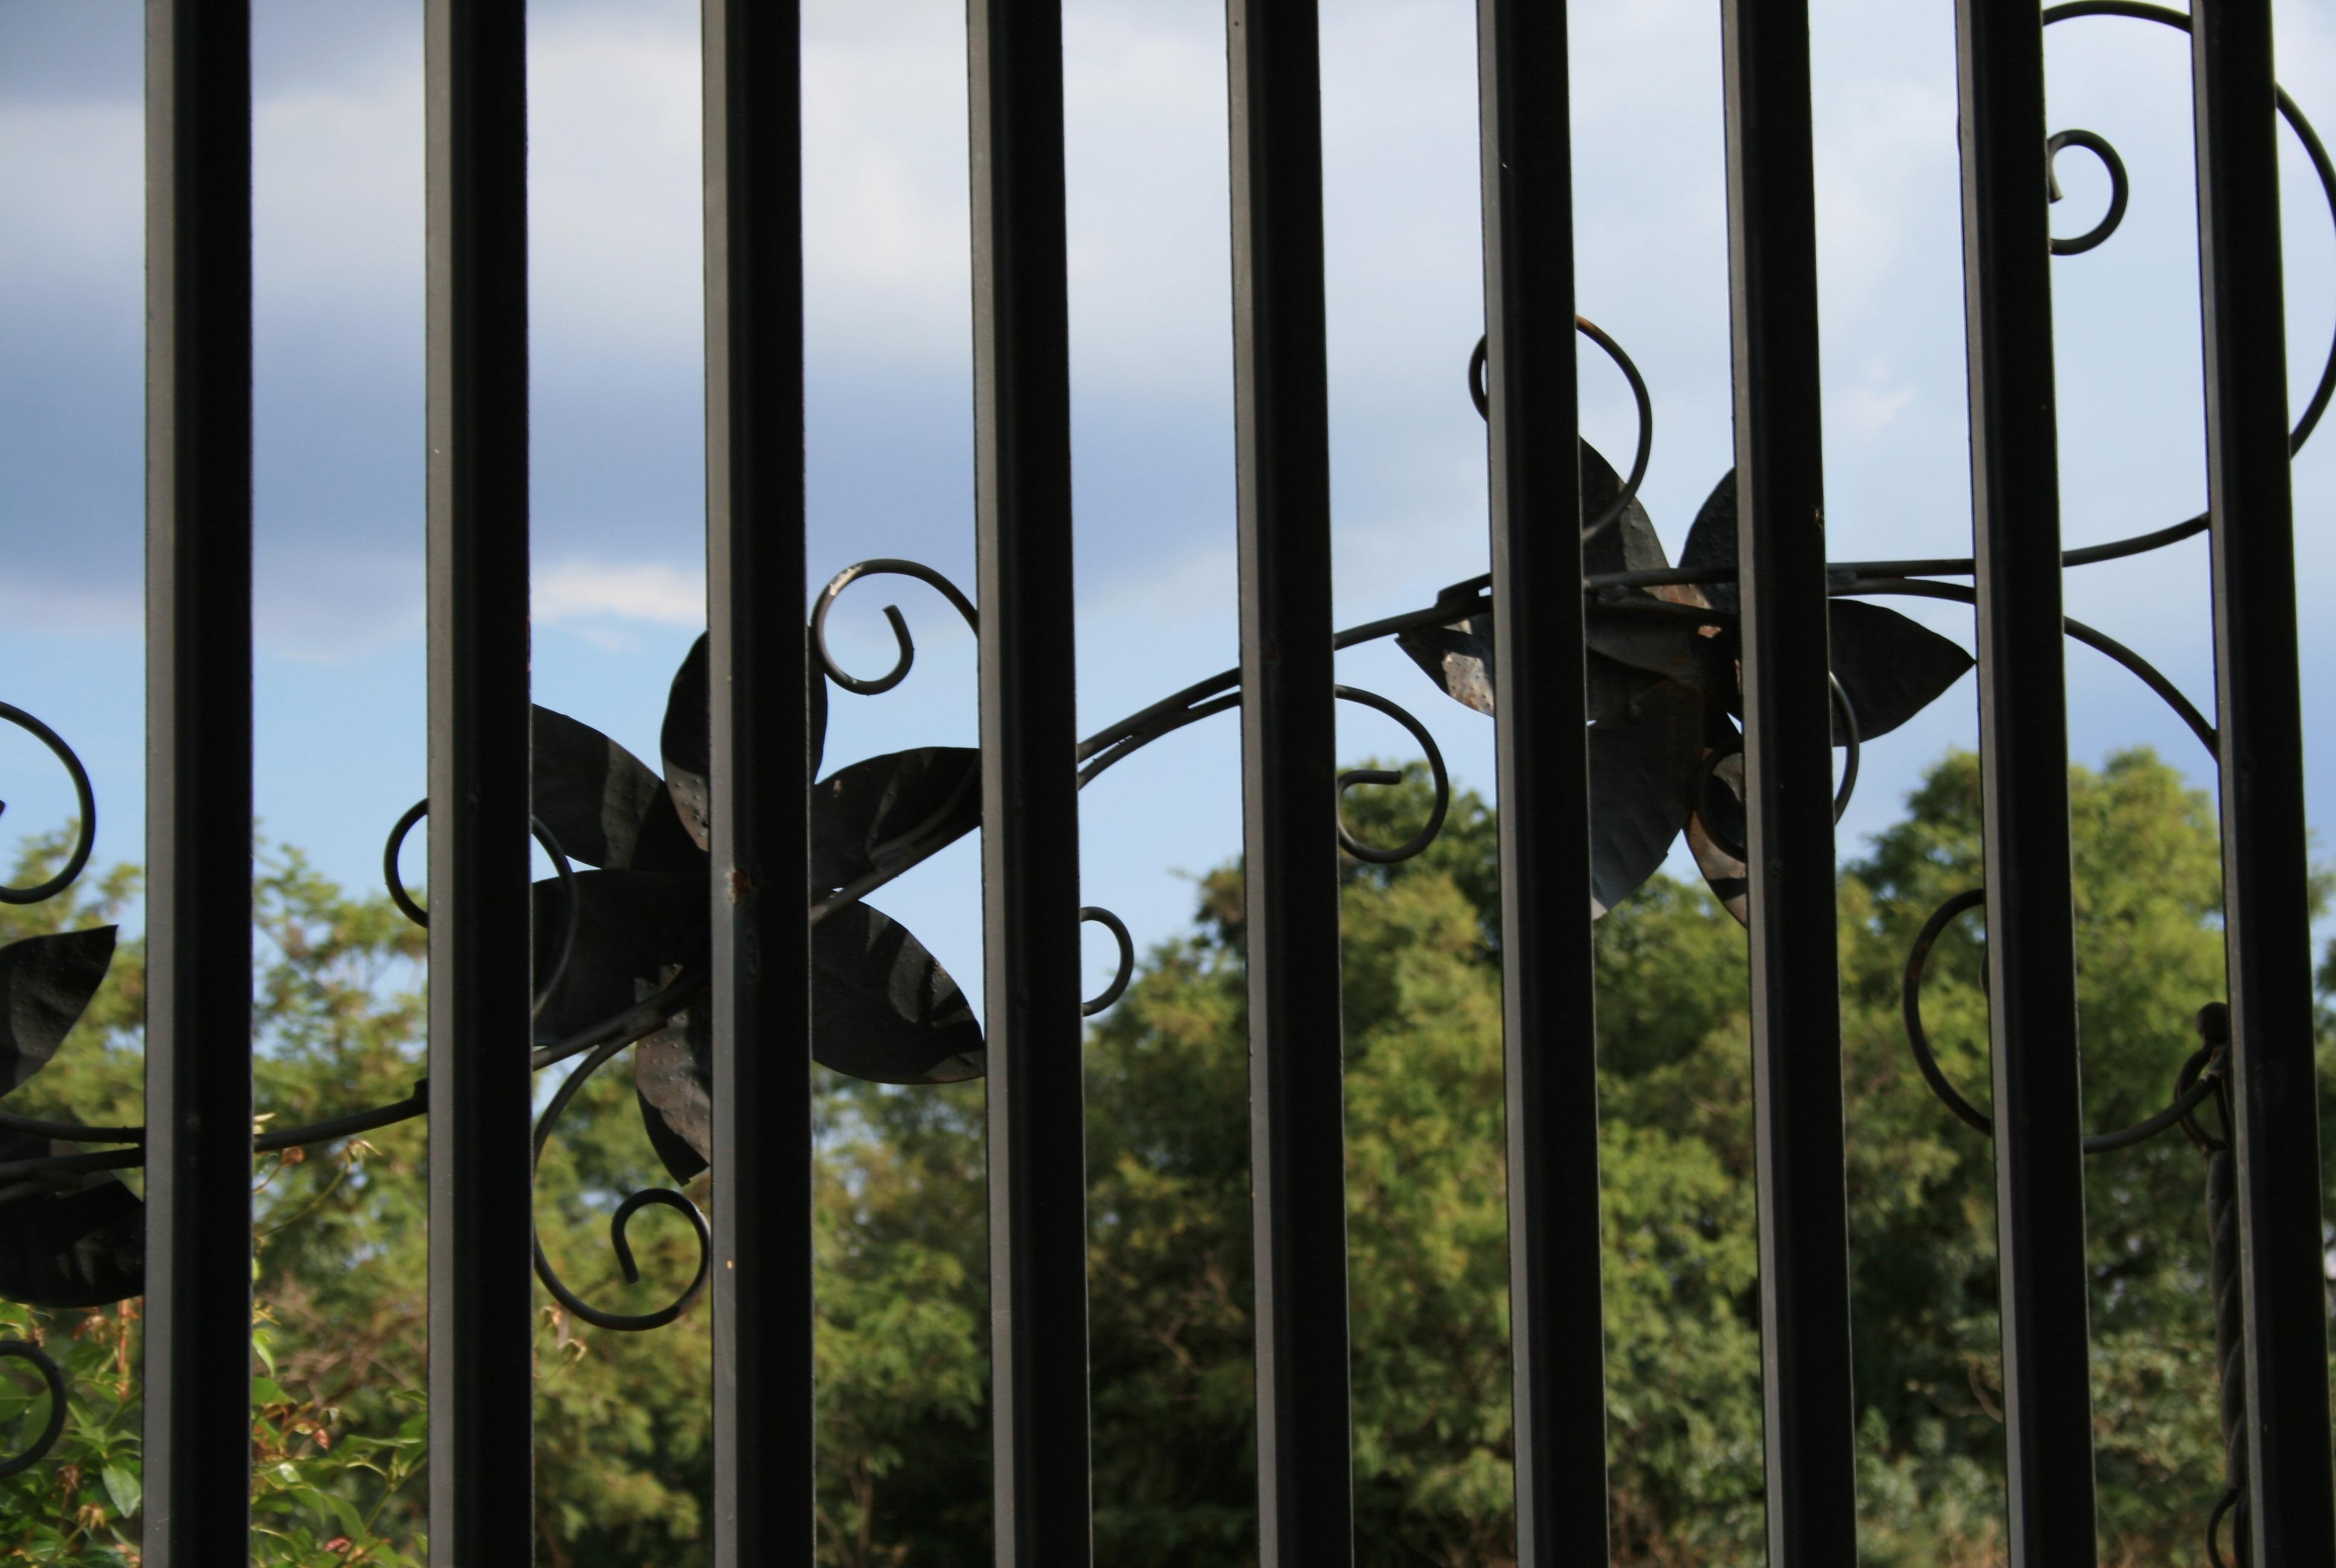 Fotos gratis : cerca, cielo, madera, luz de sol, ventana, metal ...